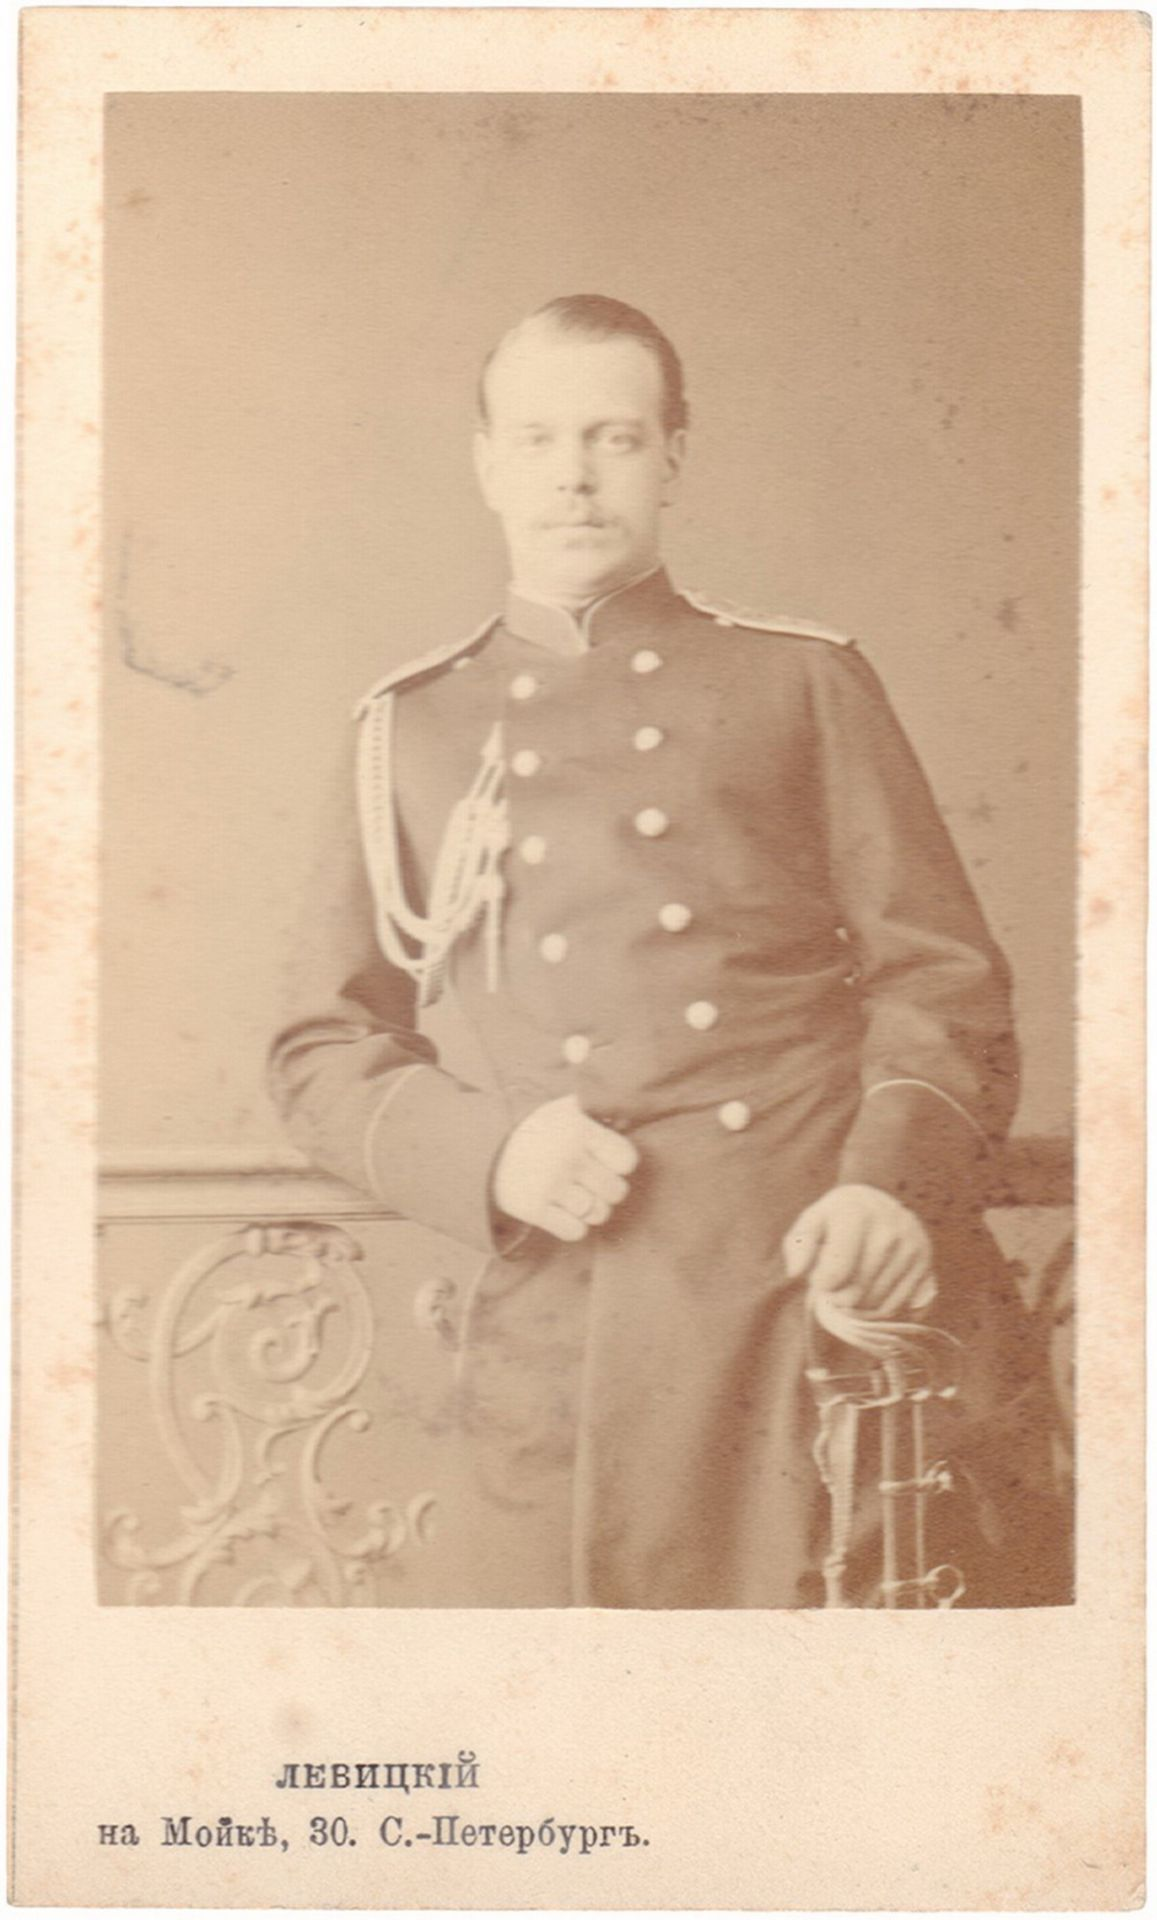 [Russian Empire. Romanov]. Levitsky, S. Cabinet portrait of Prince Alexander III of Russia. Photogra